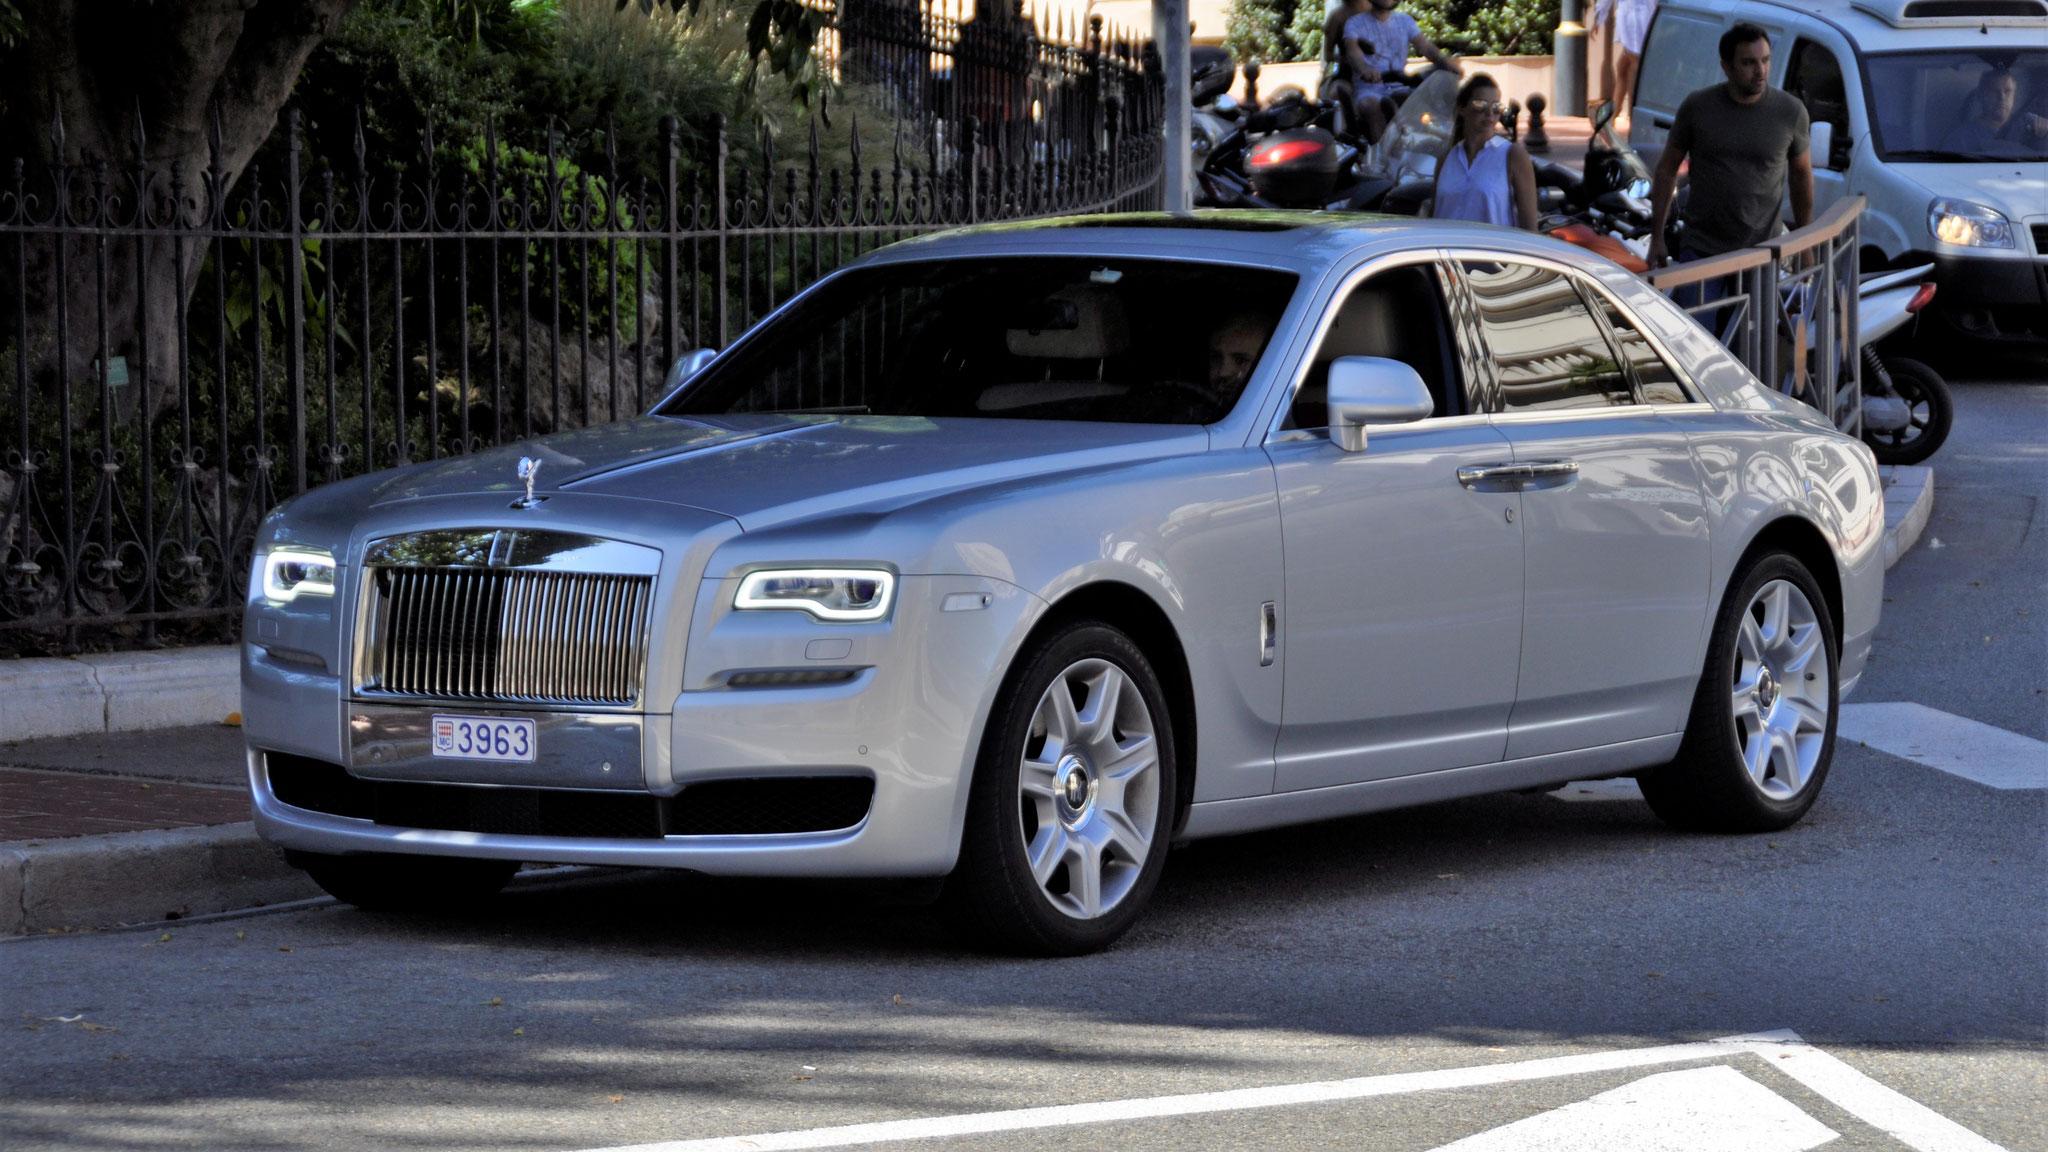 Rolls Royce Ghost Series II - 3963 (MC)